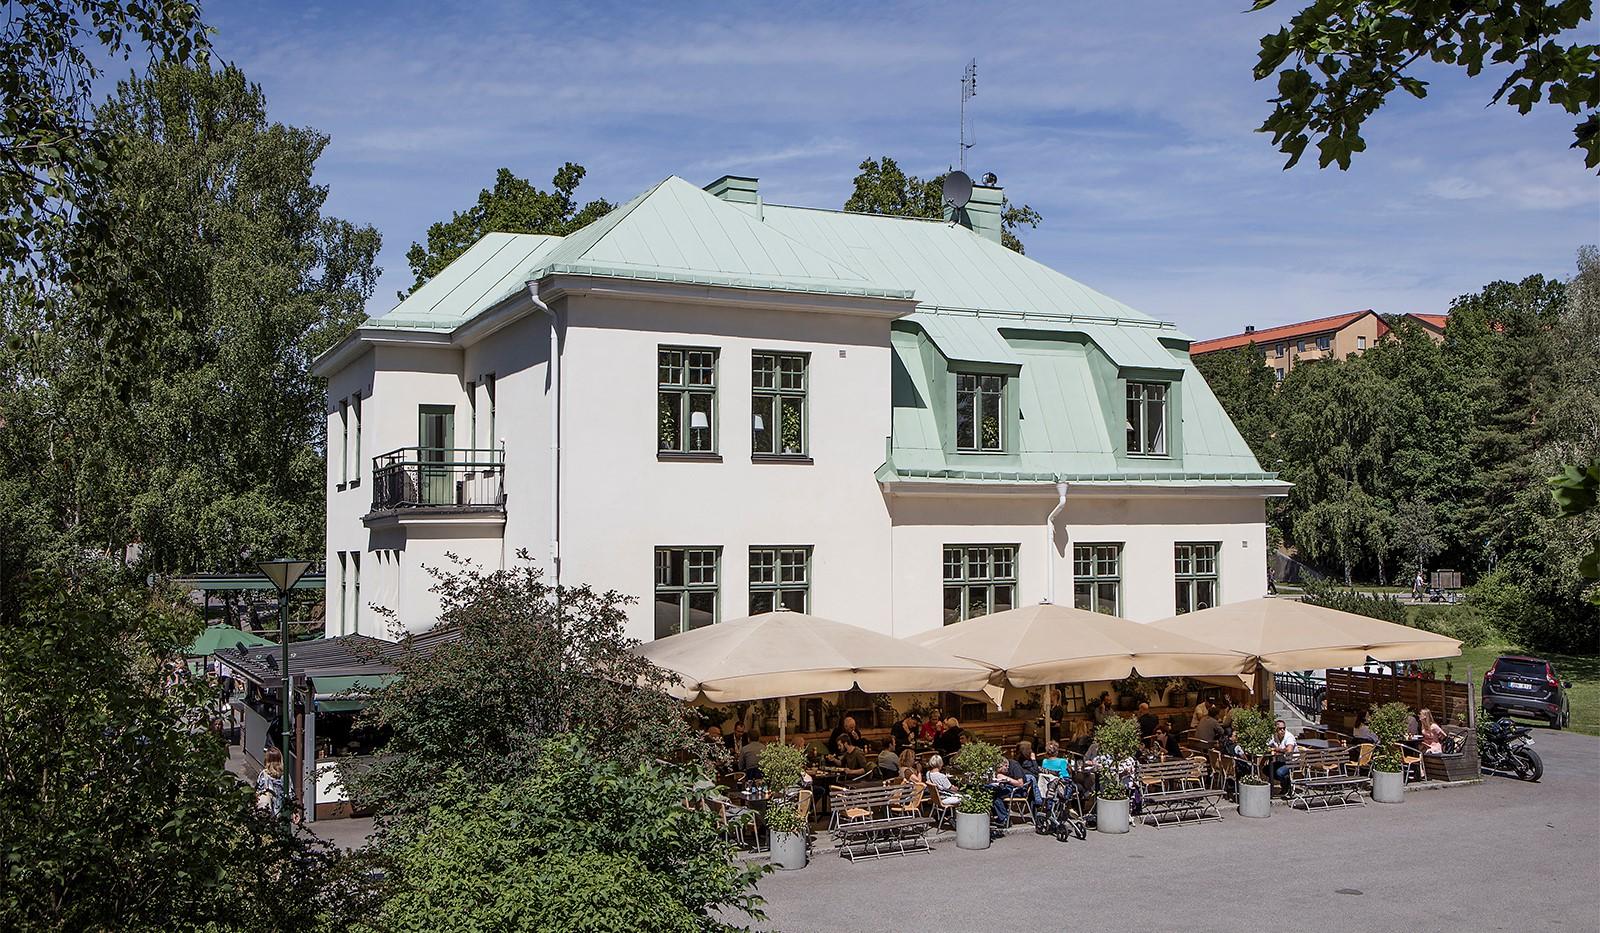 Jenny Nyströms Gata 12 - Långbro Wärdshus